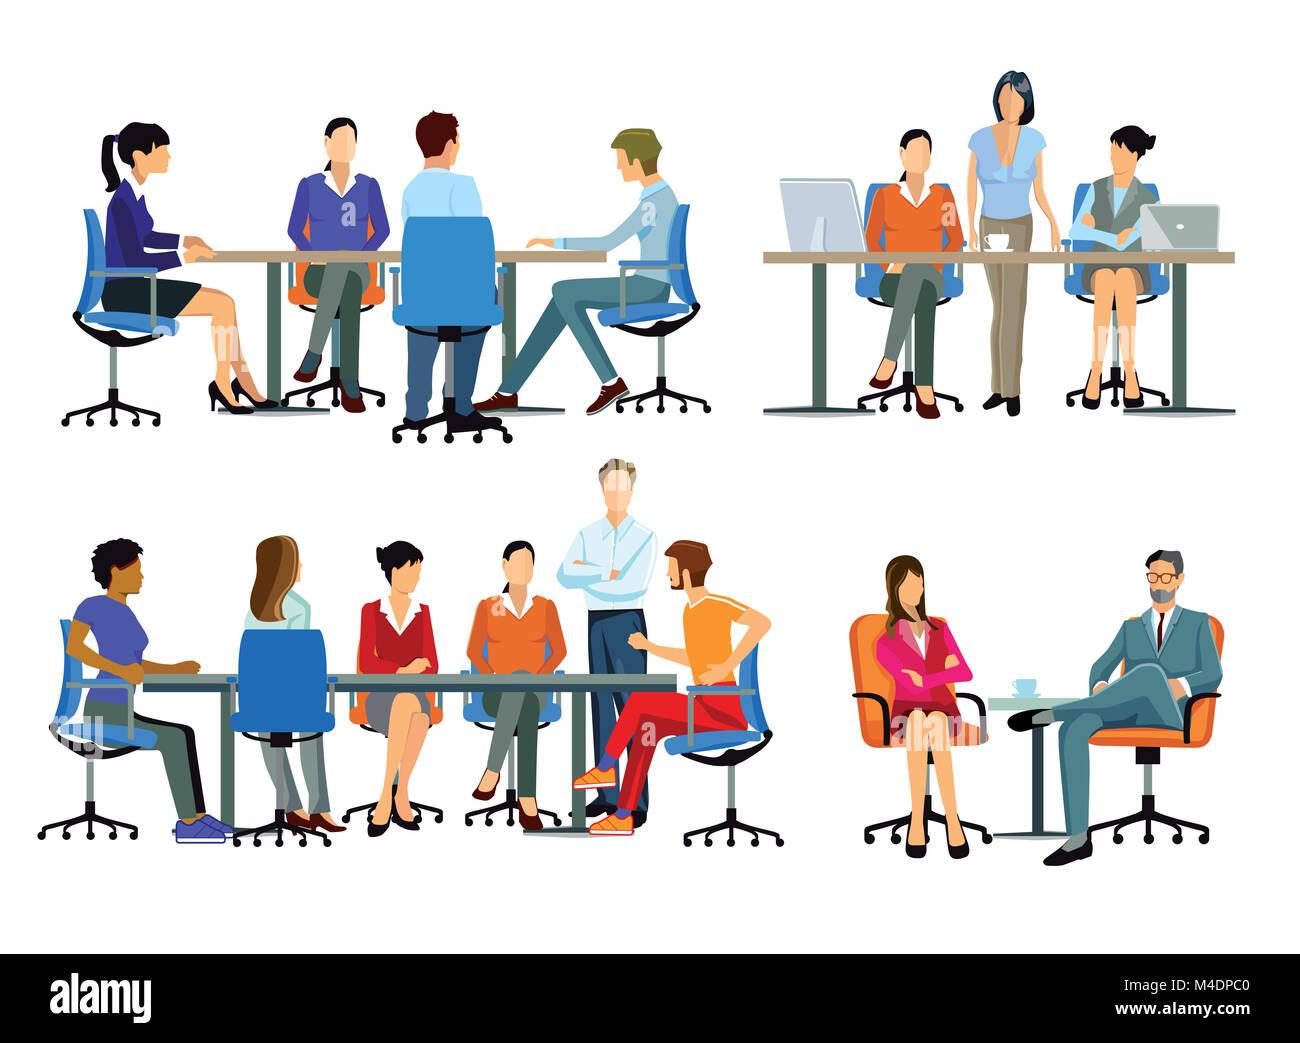 Office Work, workflow, coworkink, Teamwork - Stock Image